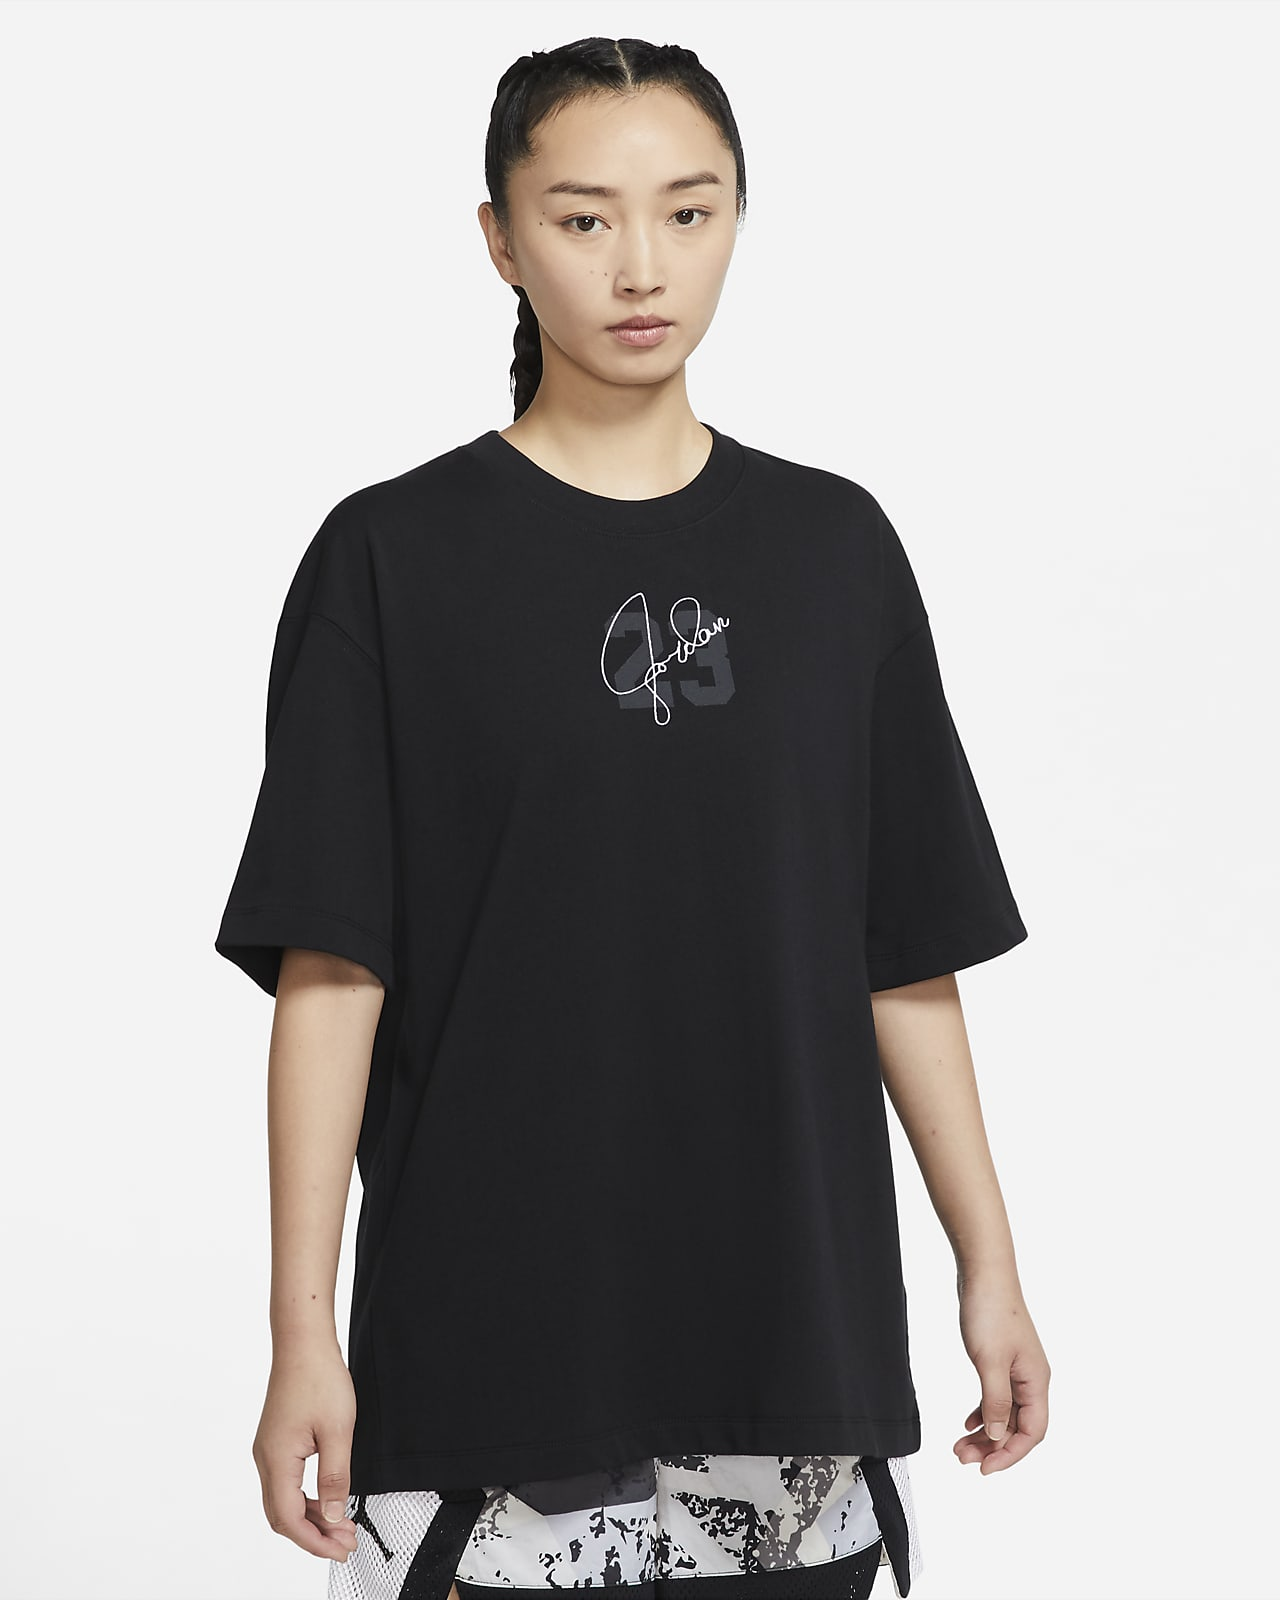 Jordan Essentials 女子短袖印花T恤